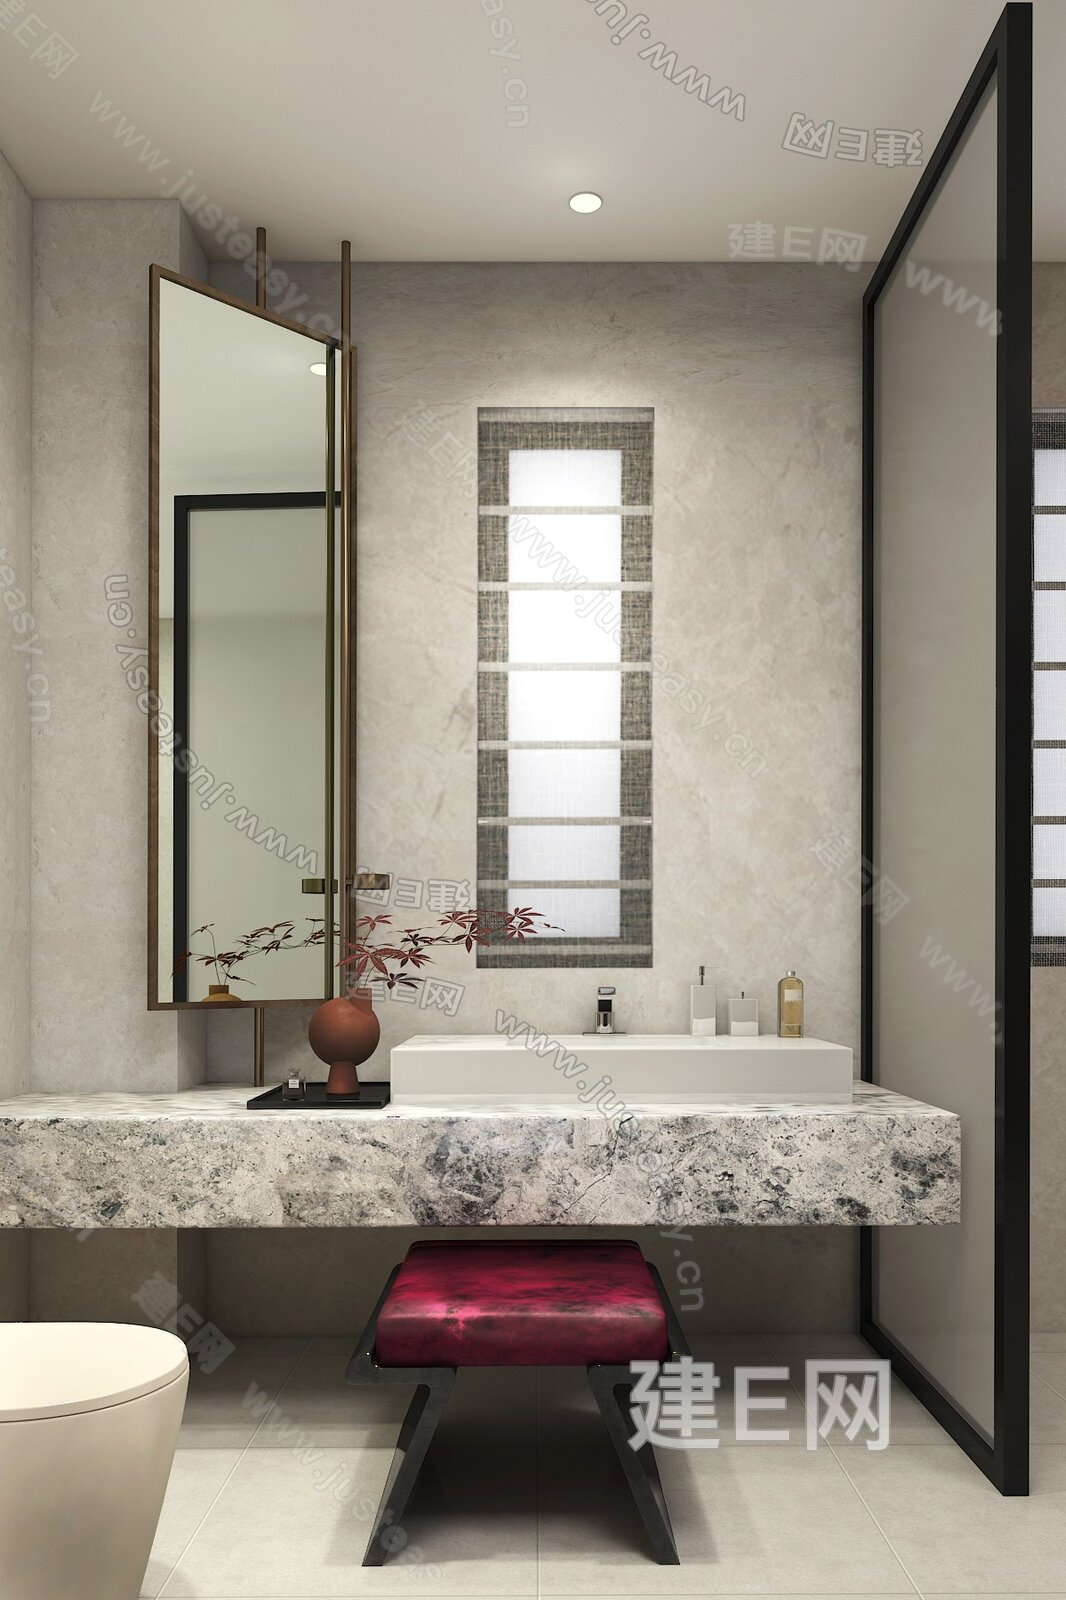 NNS DESIGN 纳沃设计 现代新中式卫浴3d模型